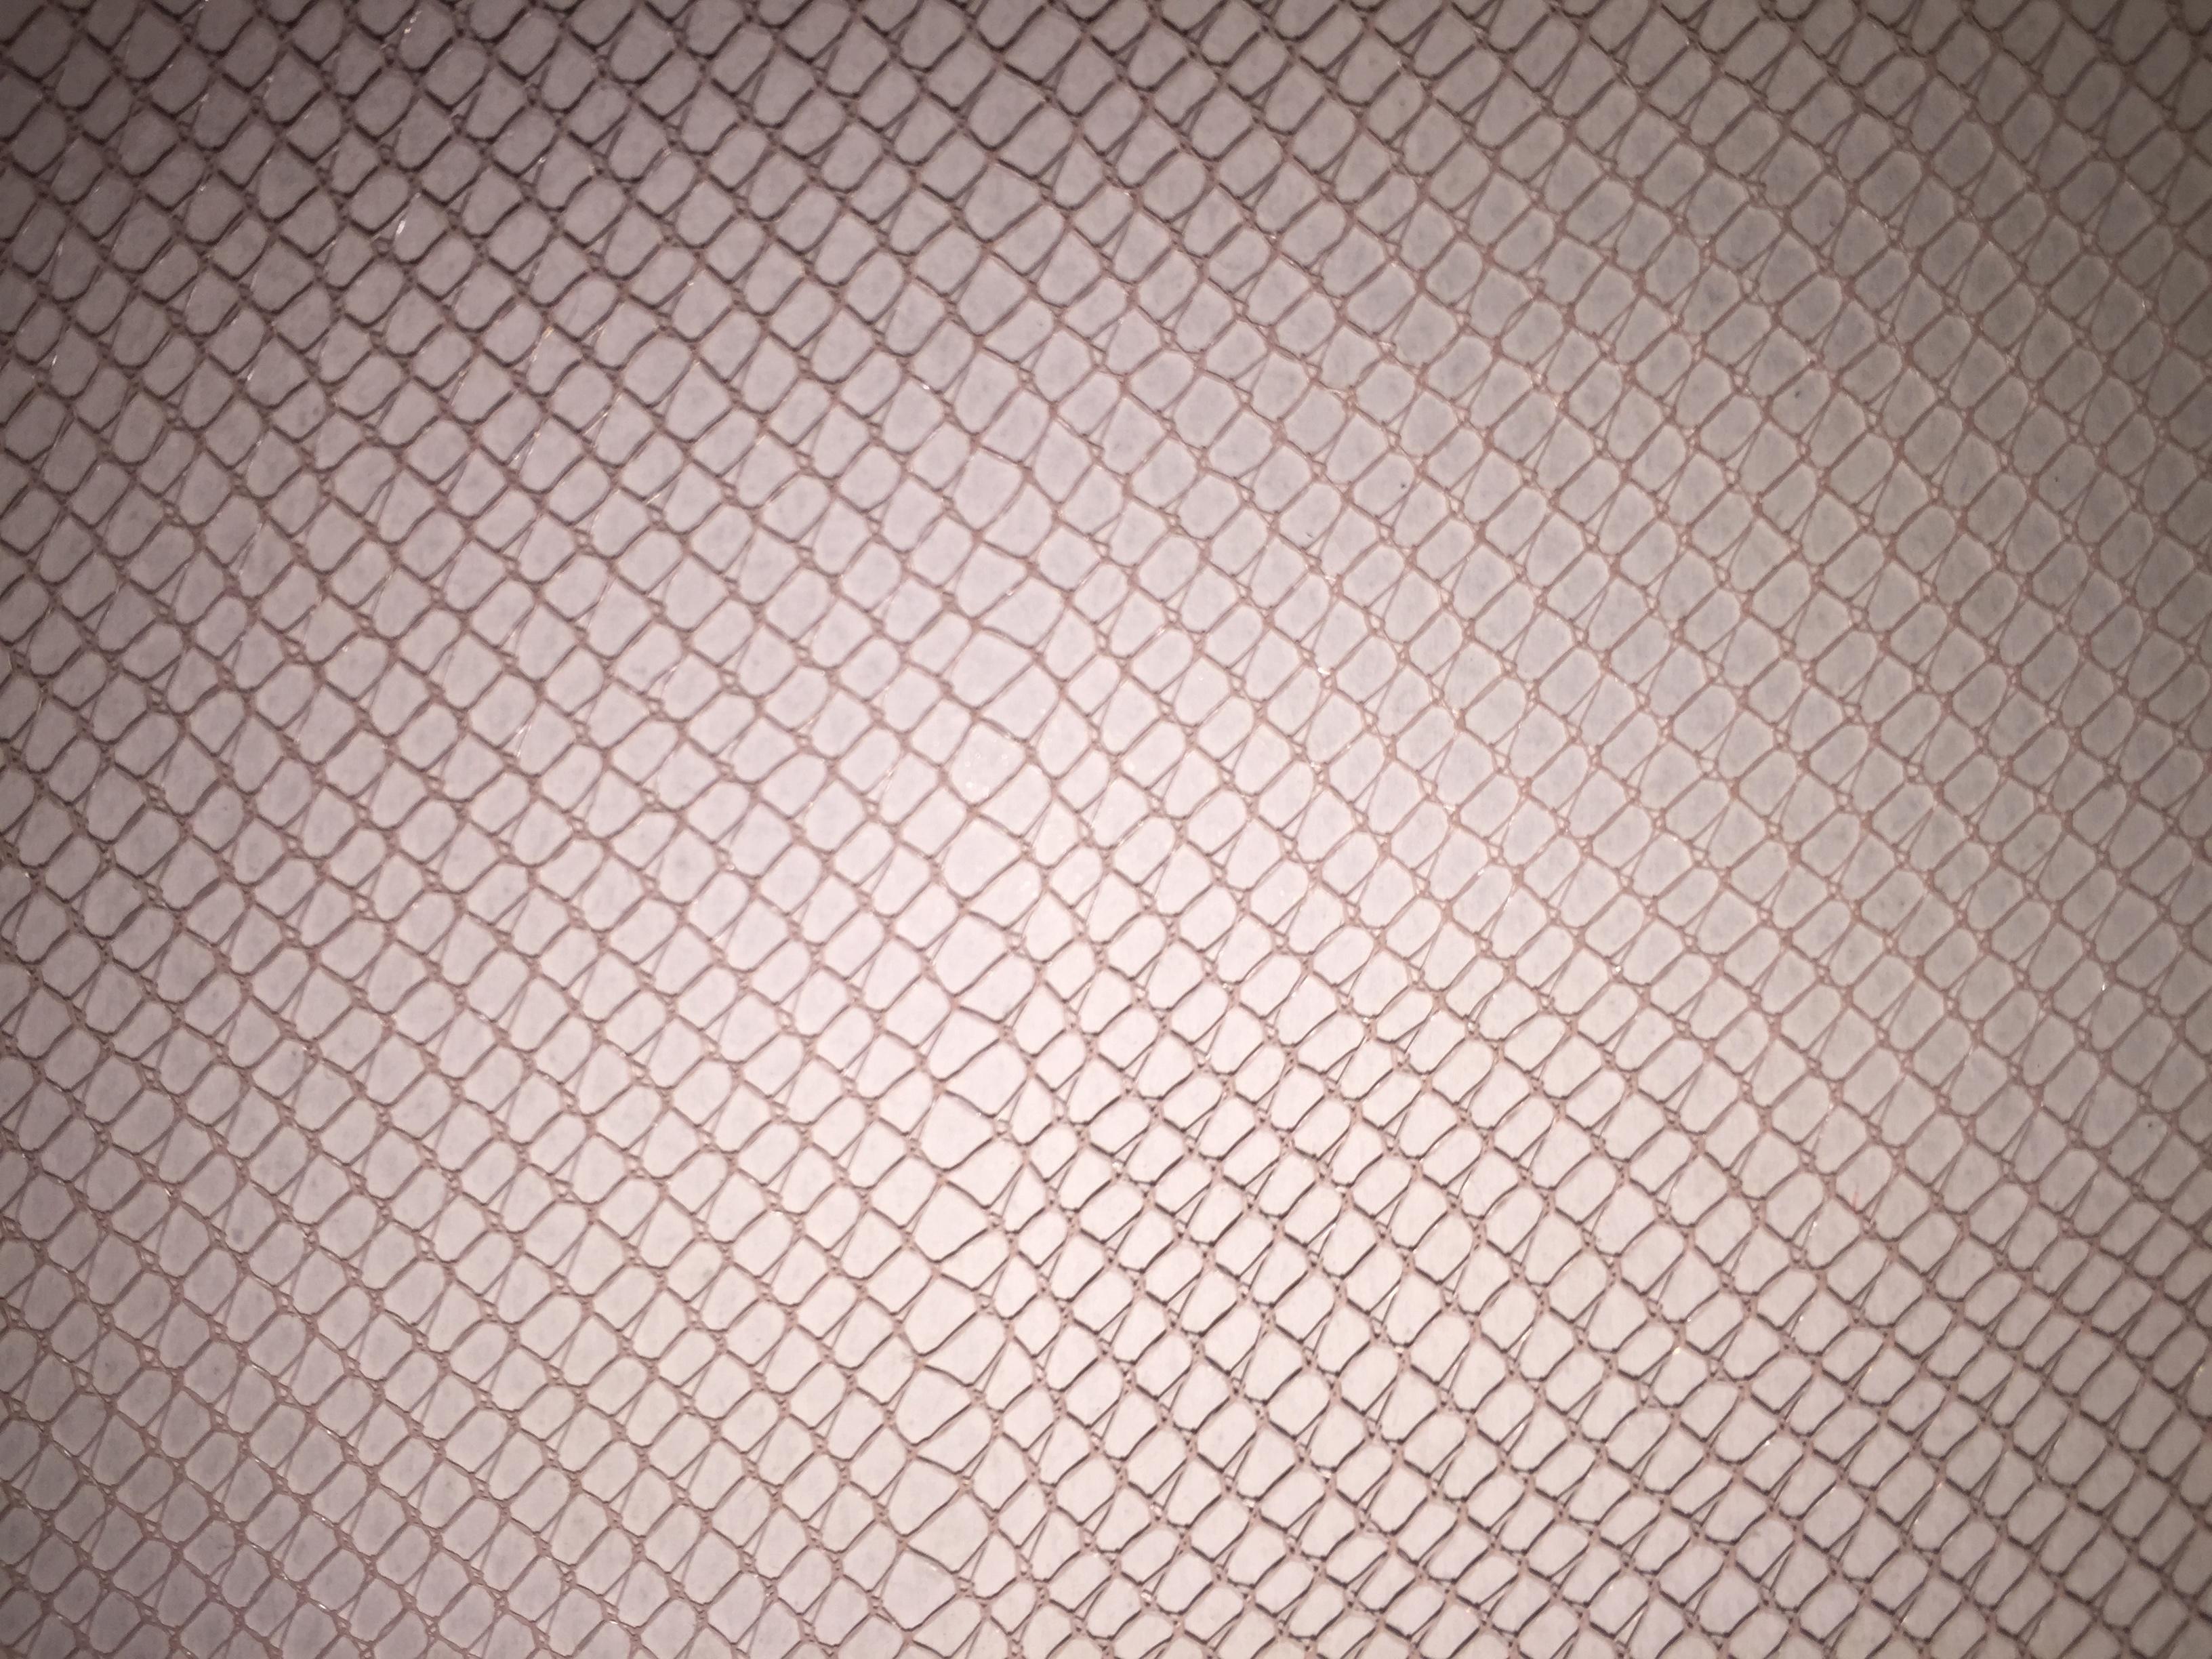 Mosquito Net Bundle